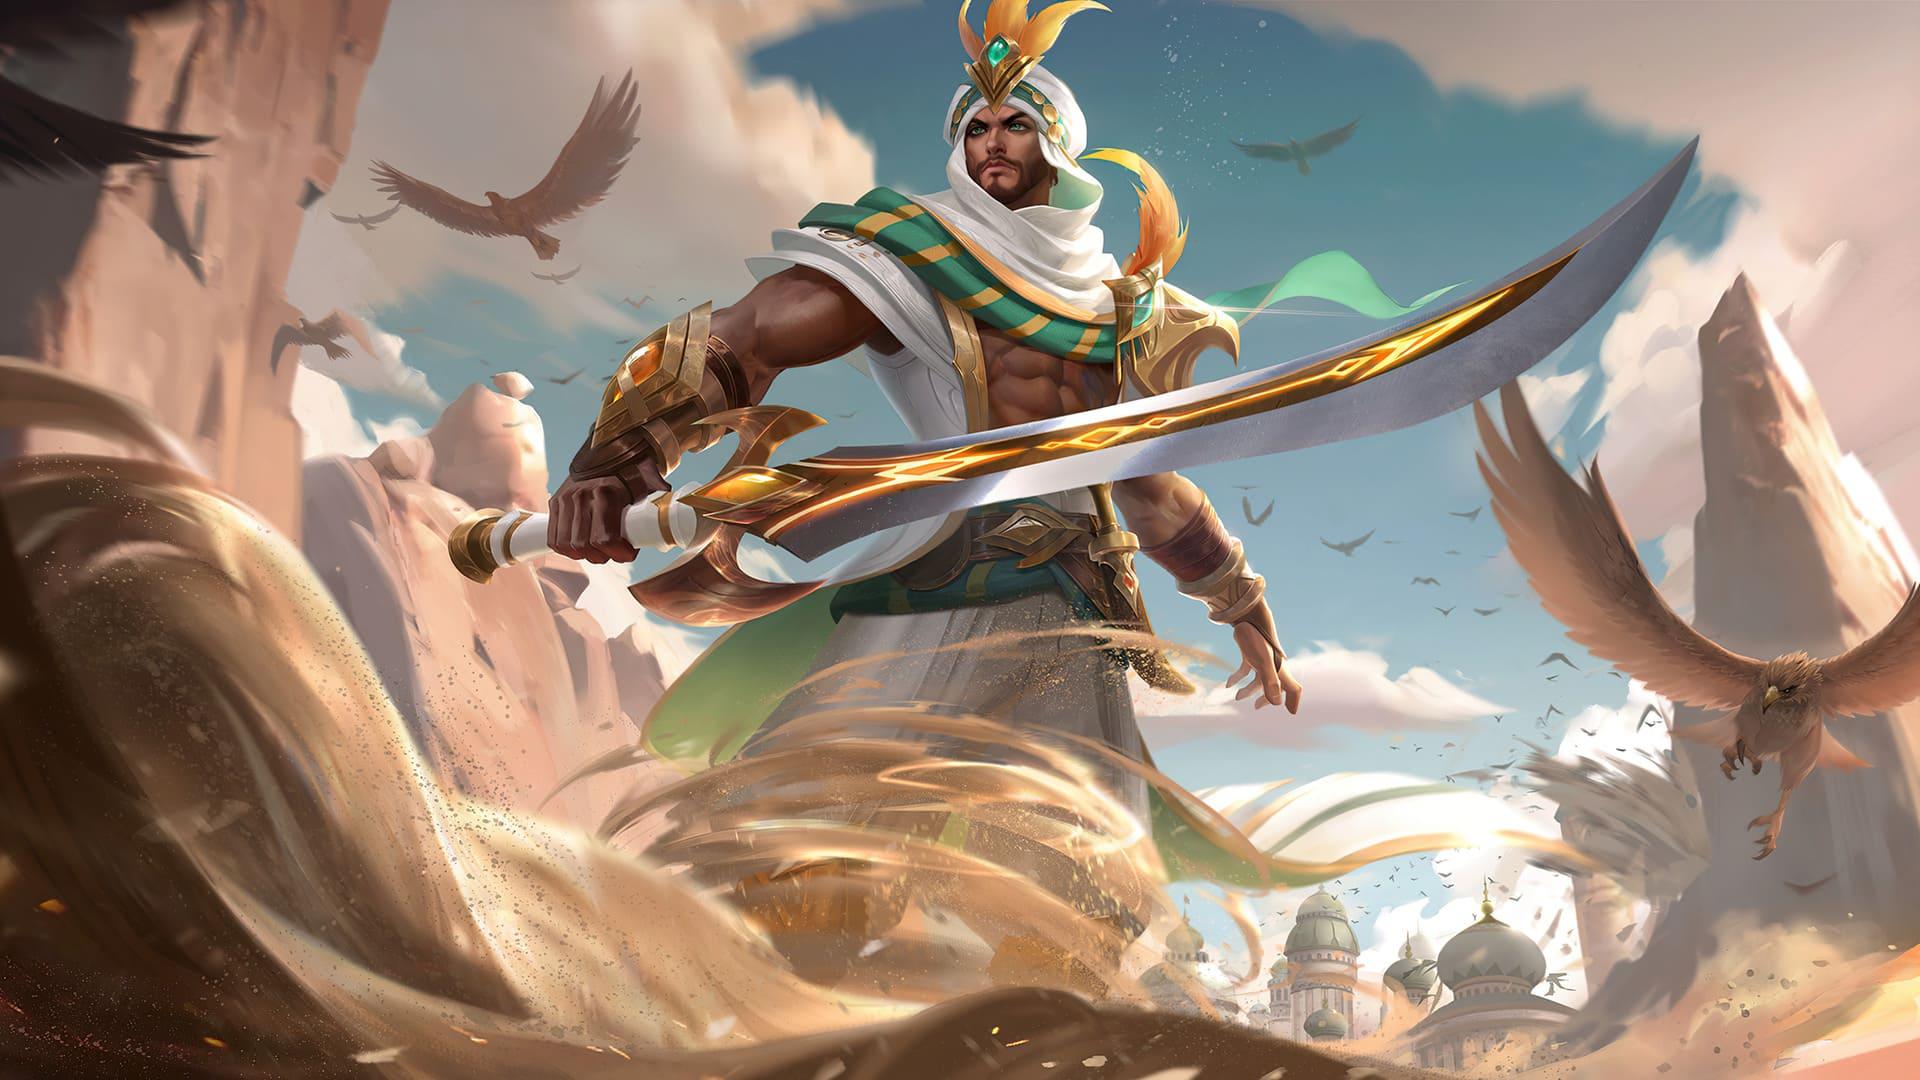 Gambar Khaleed mobile legends hd for PC